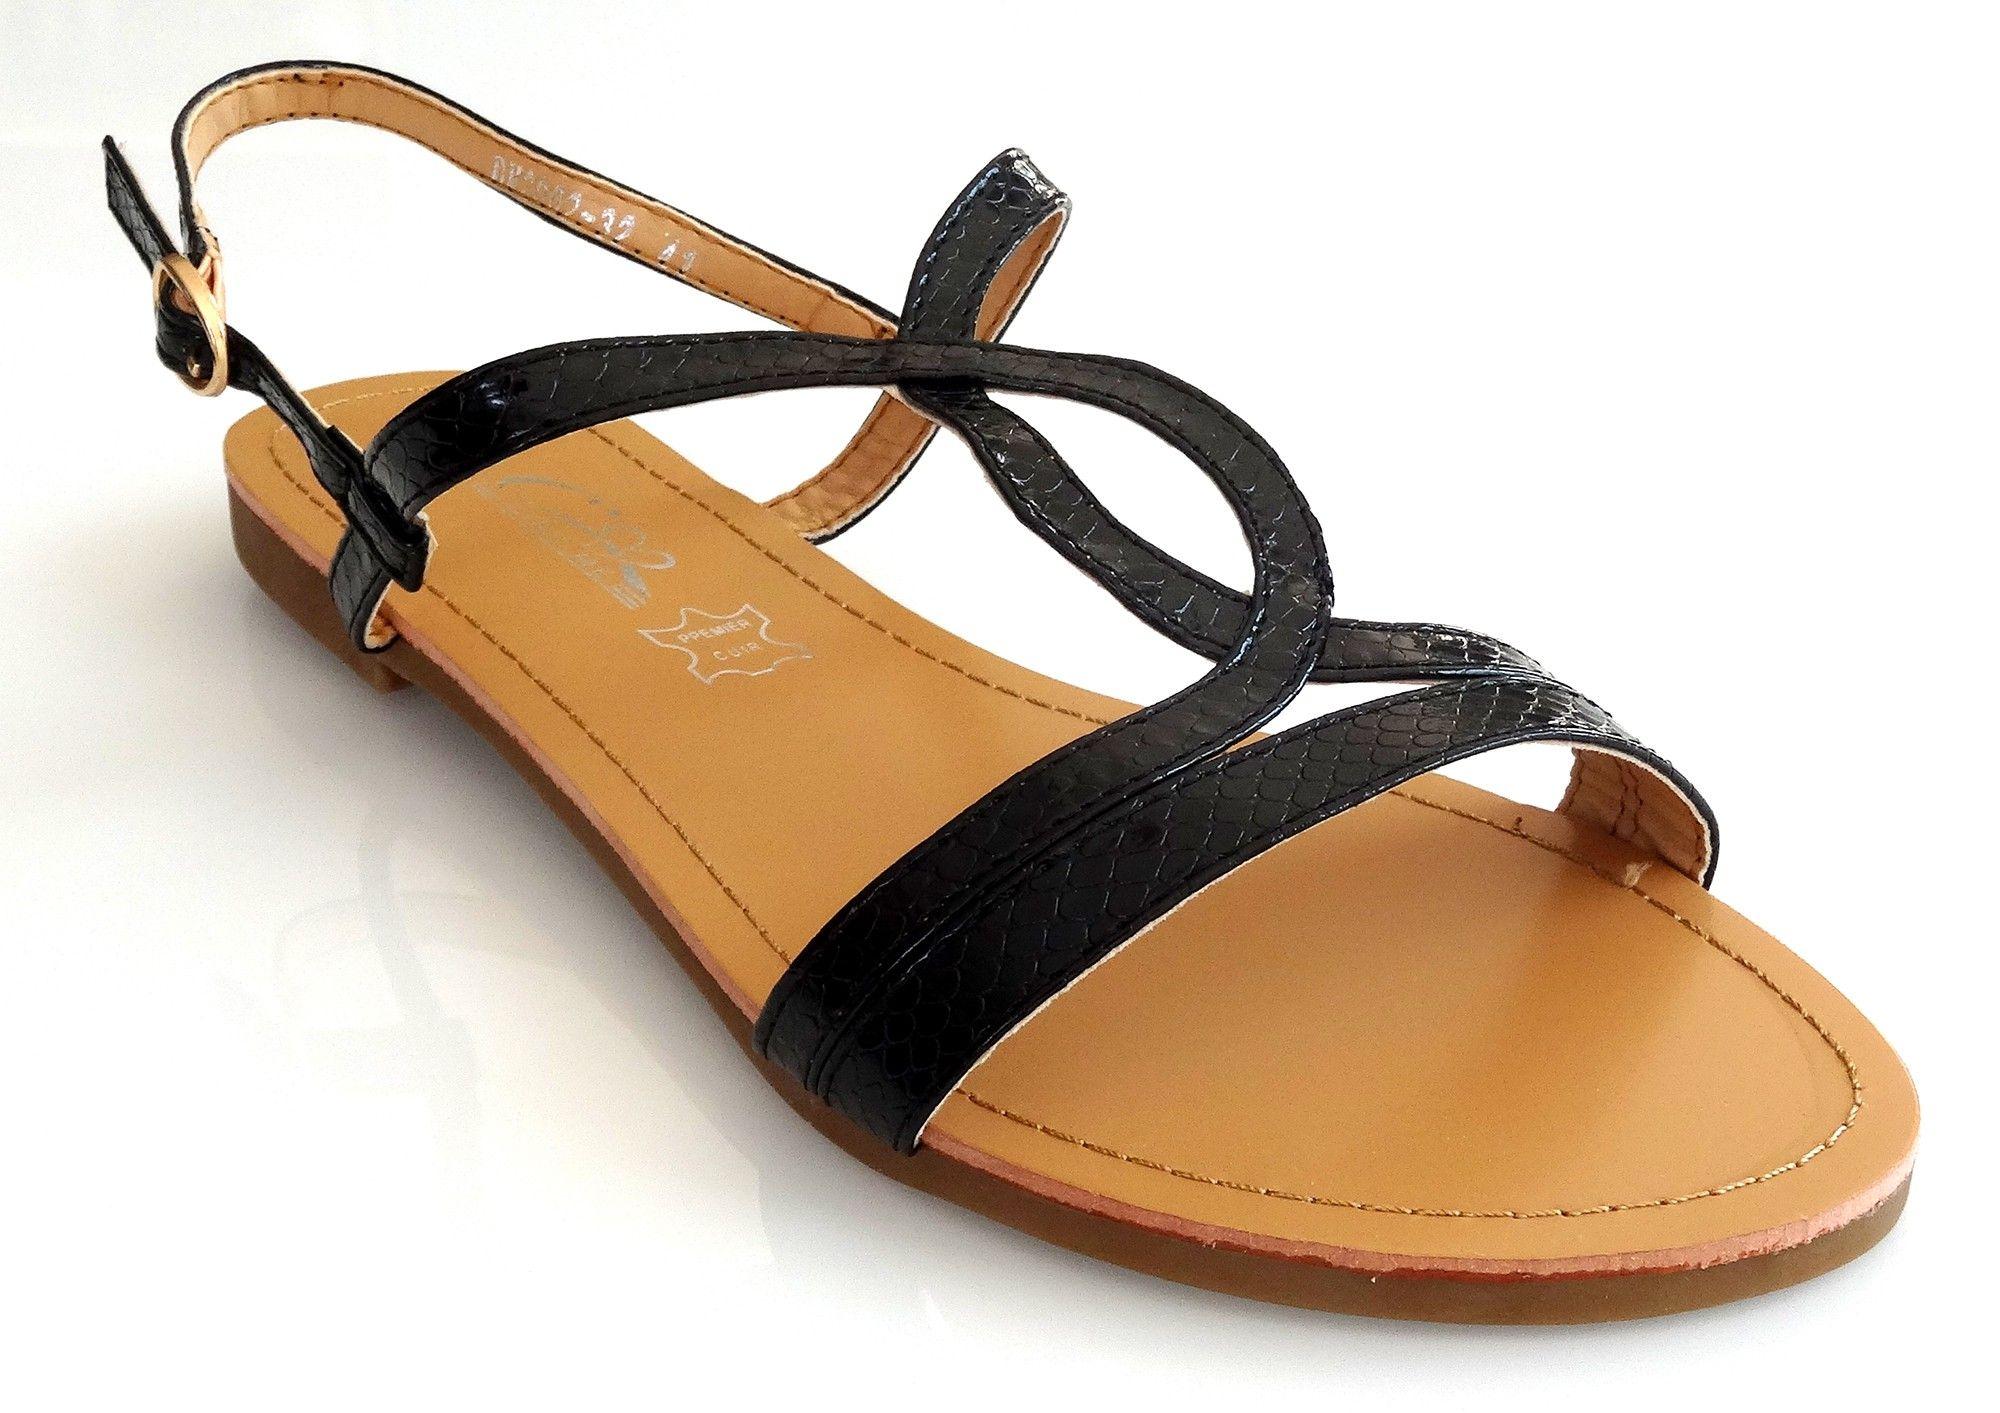 En Nos Cink Sandales Modã¨les Taille Grande Femme MeDã©couvrez QxoeWrCBd